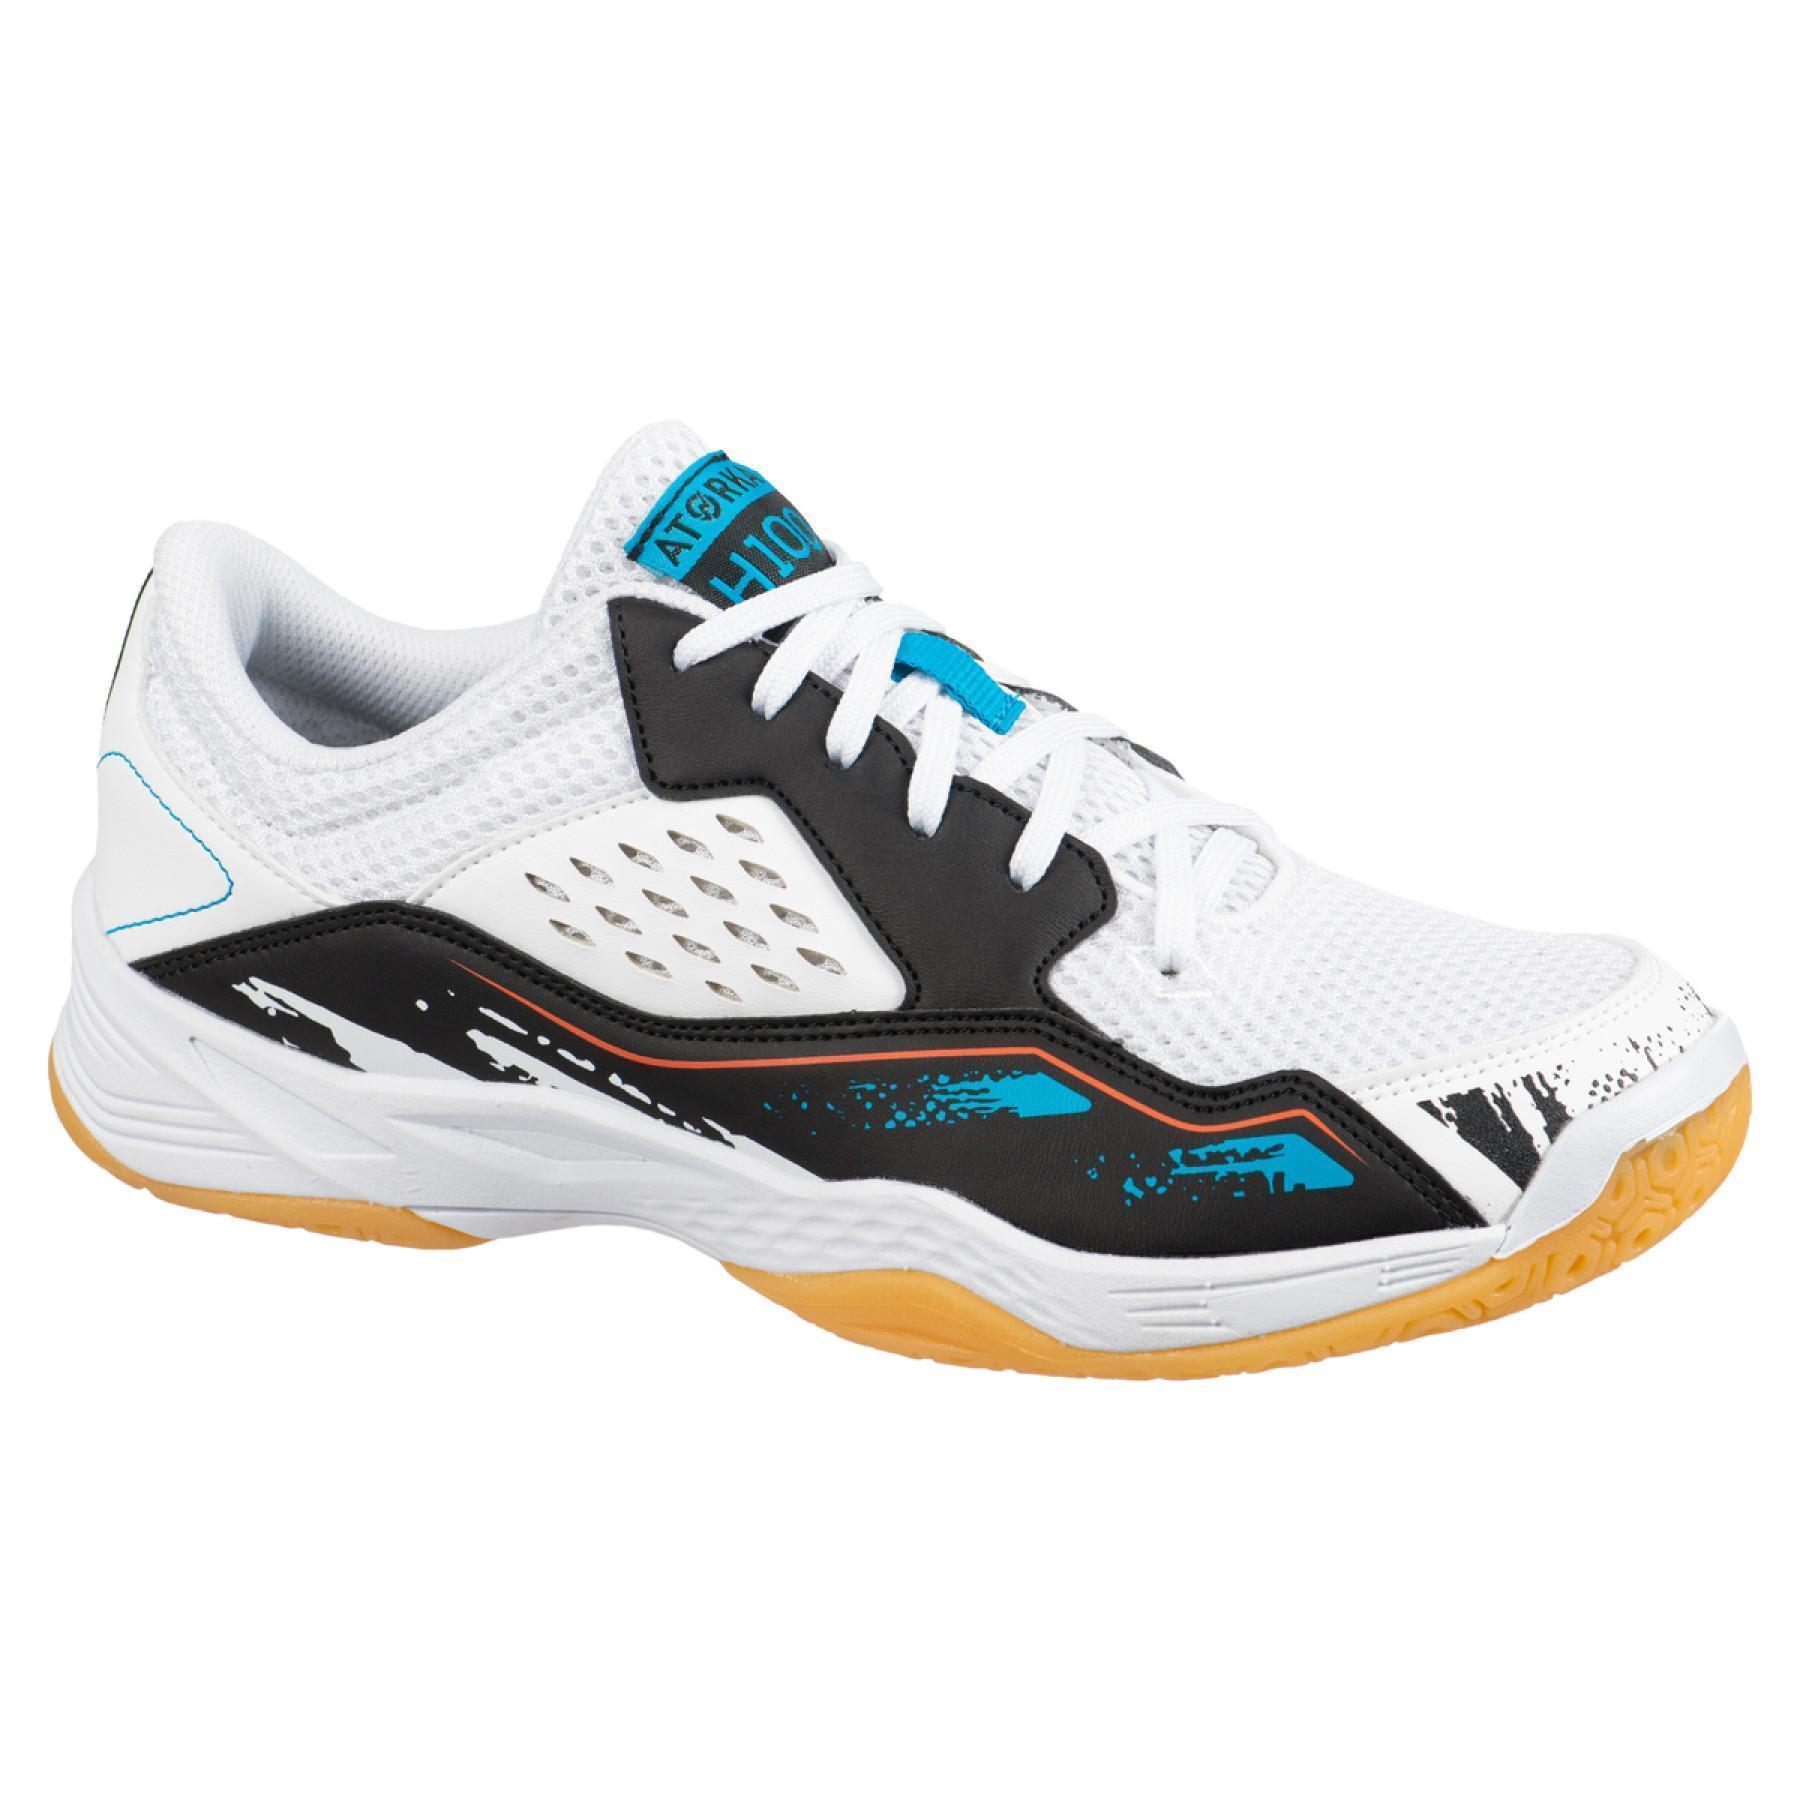 Women's shoes Atorka H100